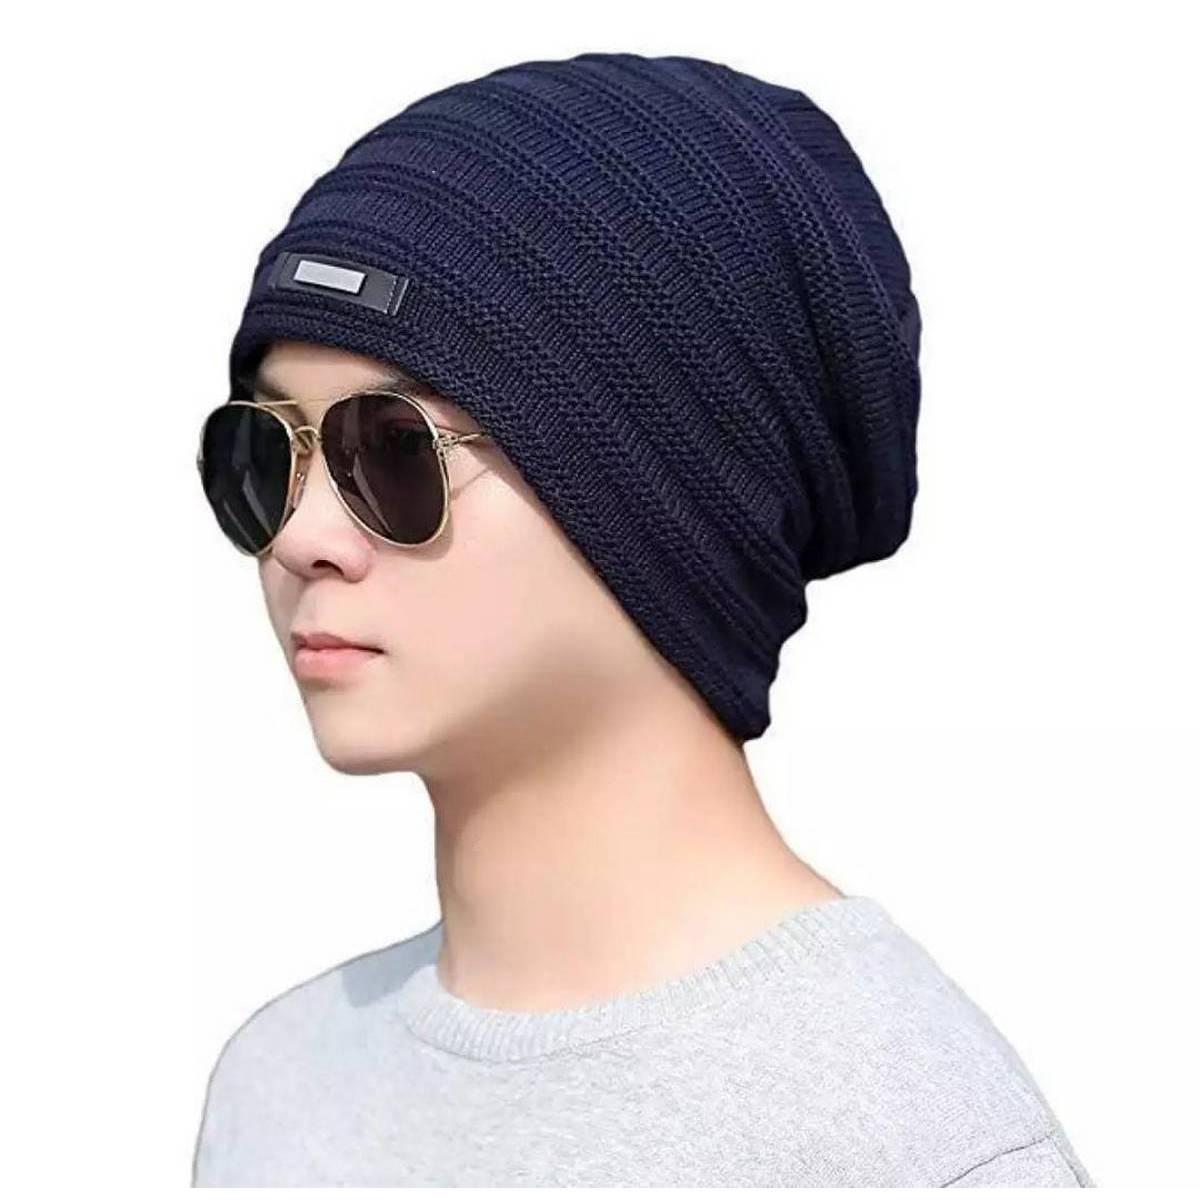 Neck Wool warm & Cap for men and women